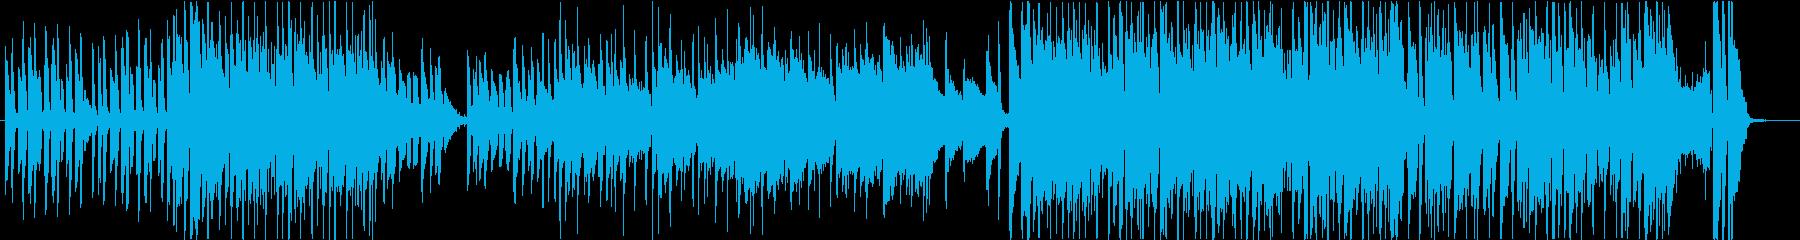 CM】爽やかで軽快な口笛BGMの再生済みの波形